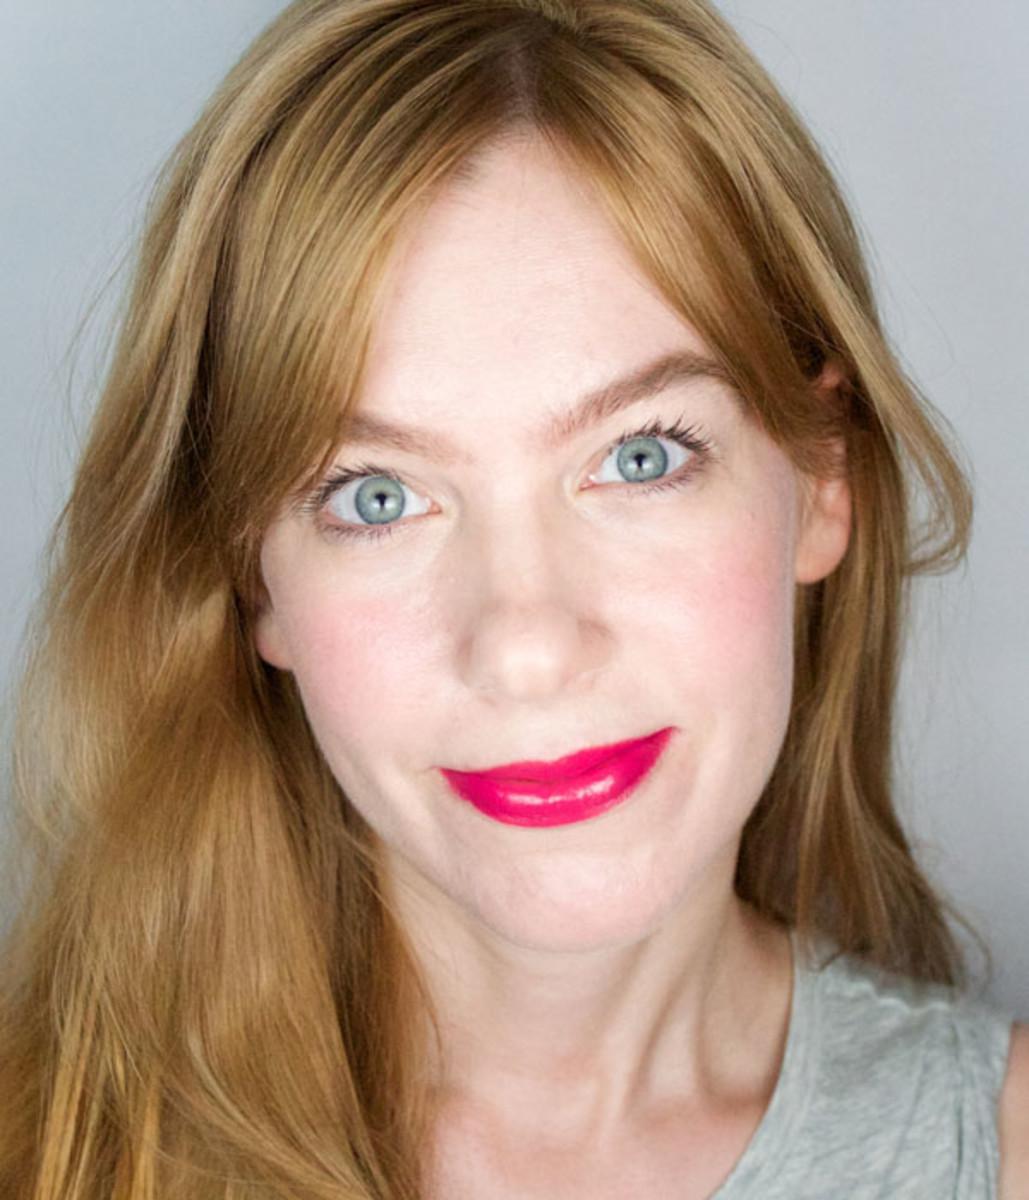 Manic Panic Lipstick in Cleo Rose (on lips)